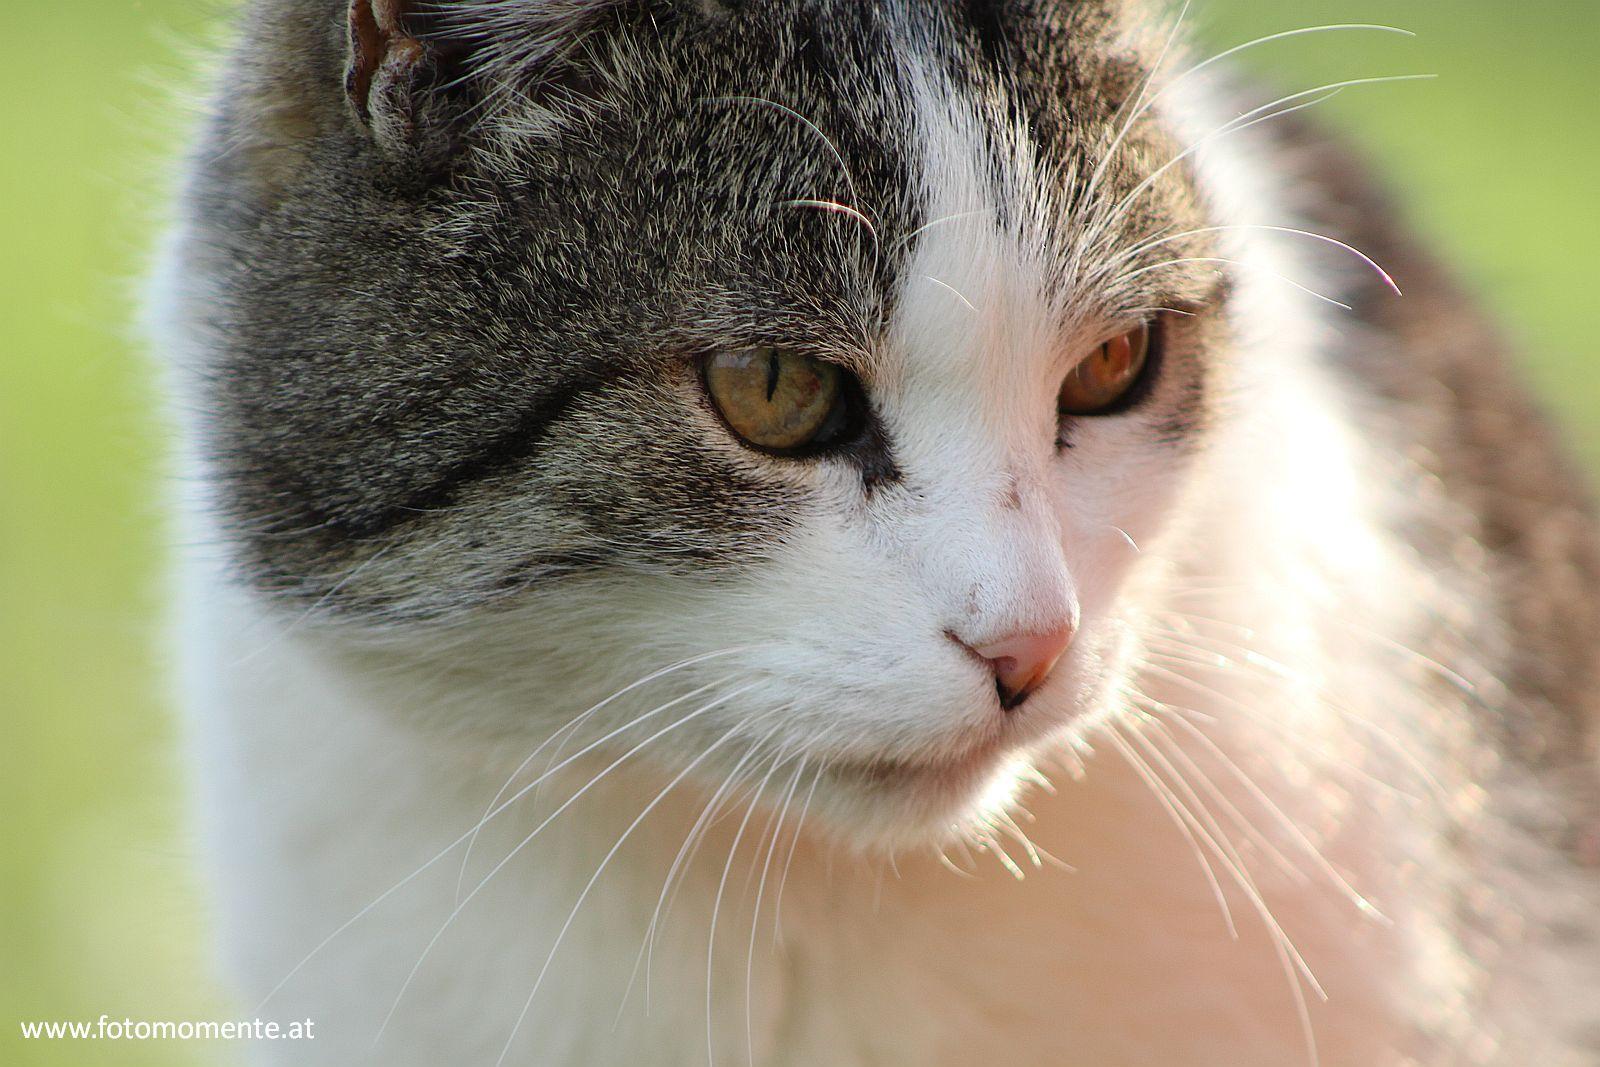 suesse grau weisse hauskatze großaufnahme - Süße grau-weiße Hauskatze in Großaufnahme